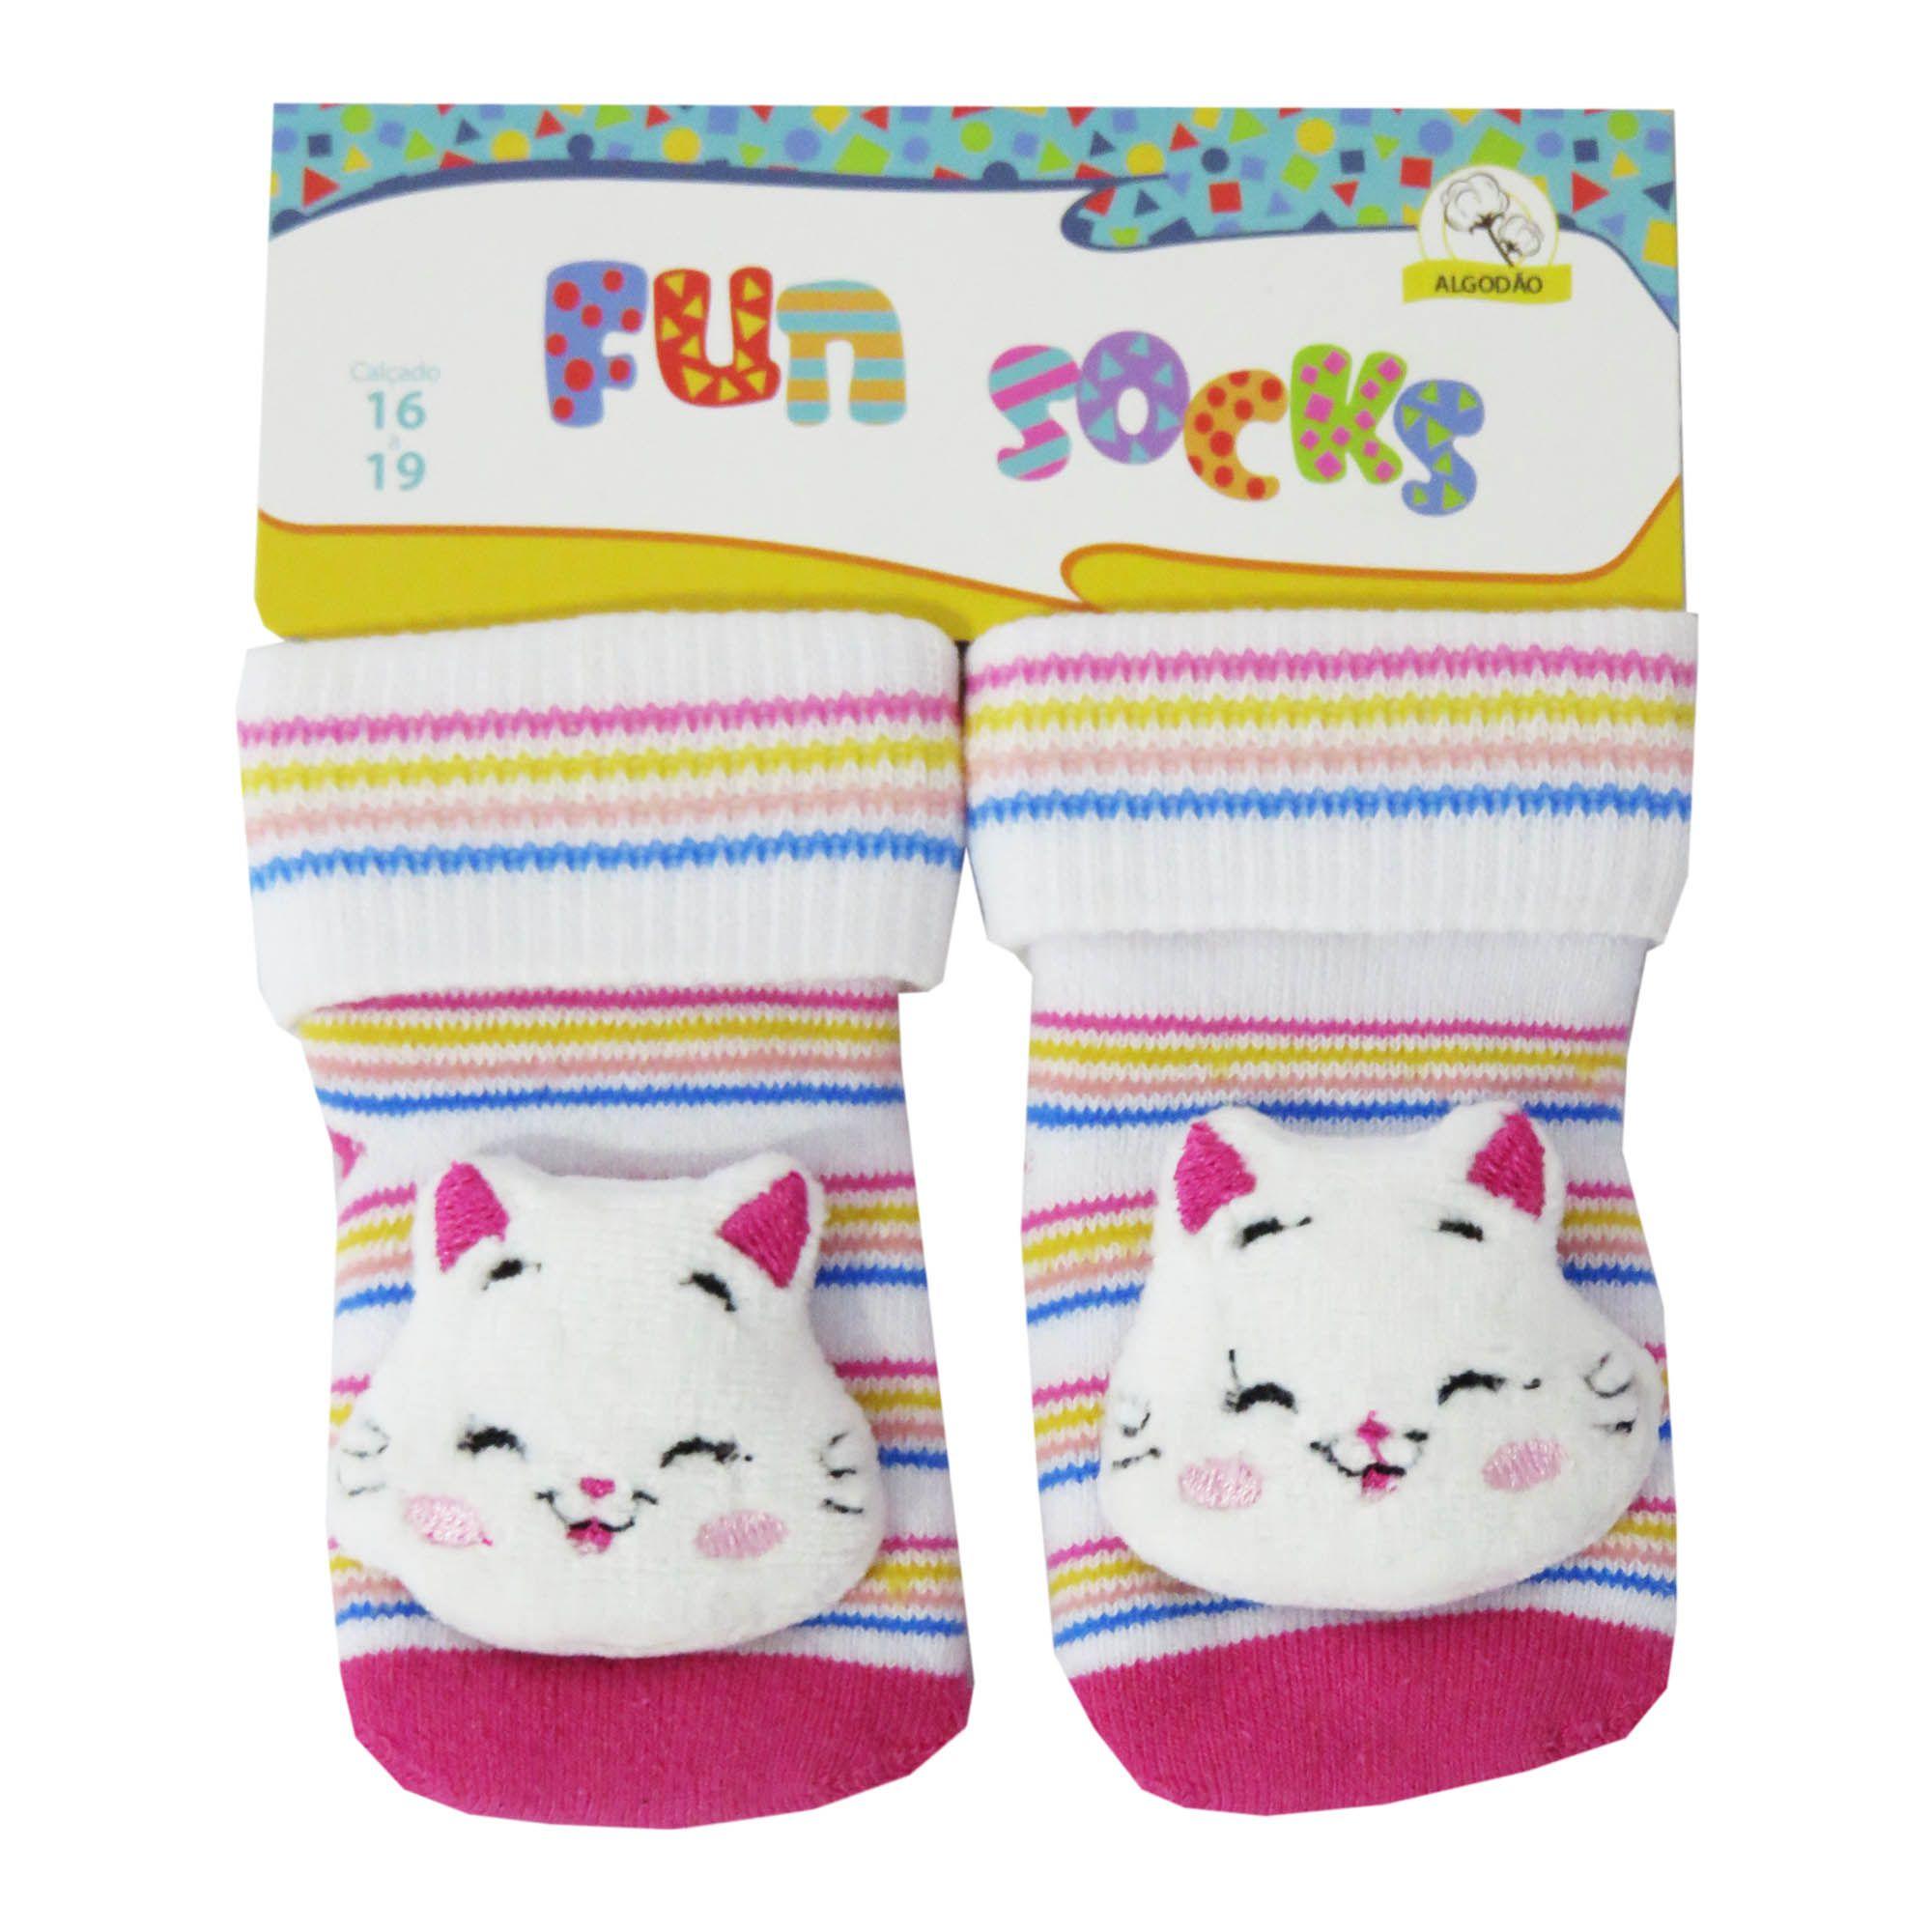 Meia Winston Aplicação Bordada Fun Socks - 16/19